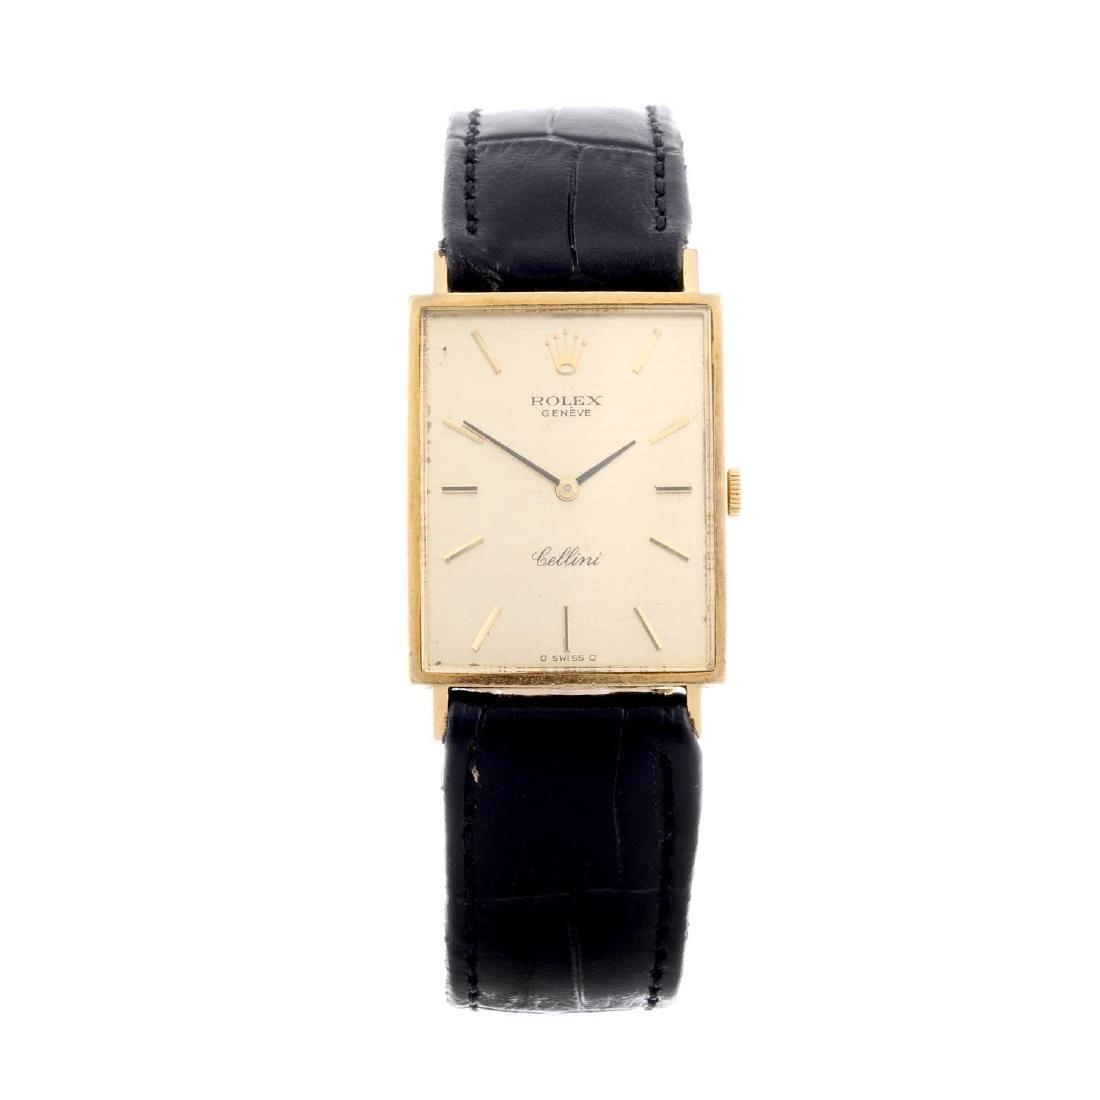 ROLEX - a gentleman's Cellini wrist watch. Circa 1973.